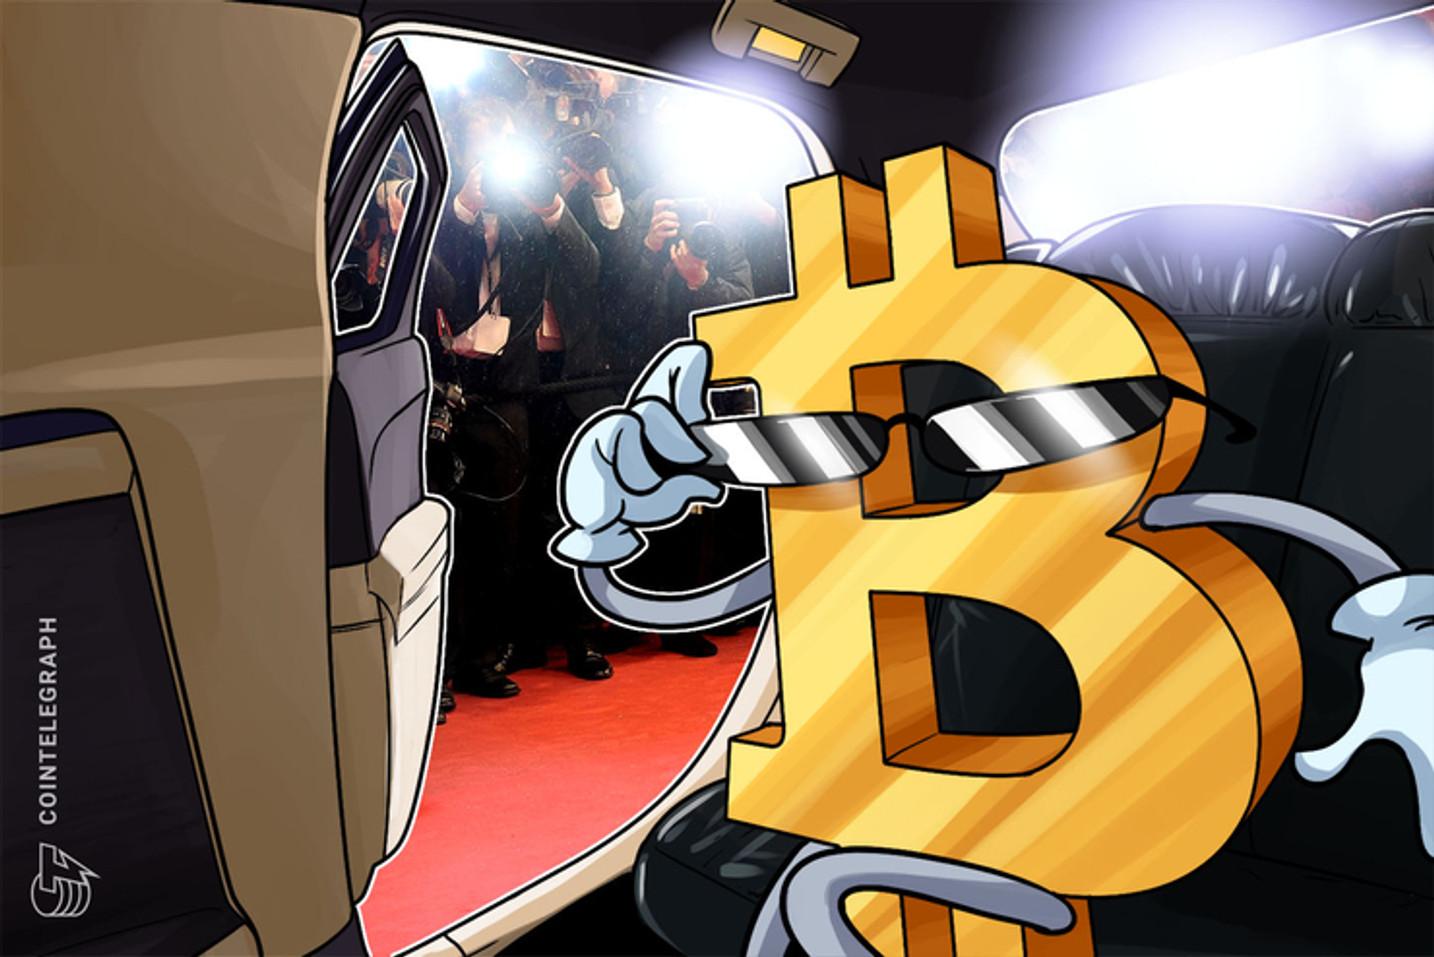 México: Desde Domitai han notado un incremento en el interés por Bitcoin